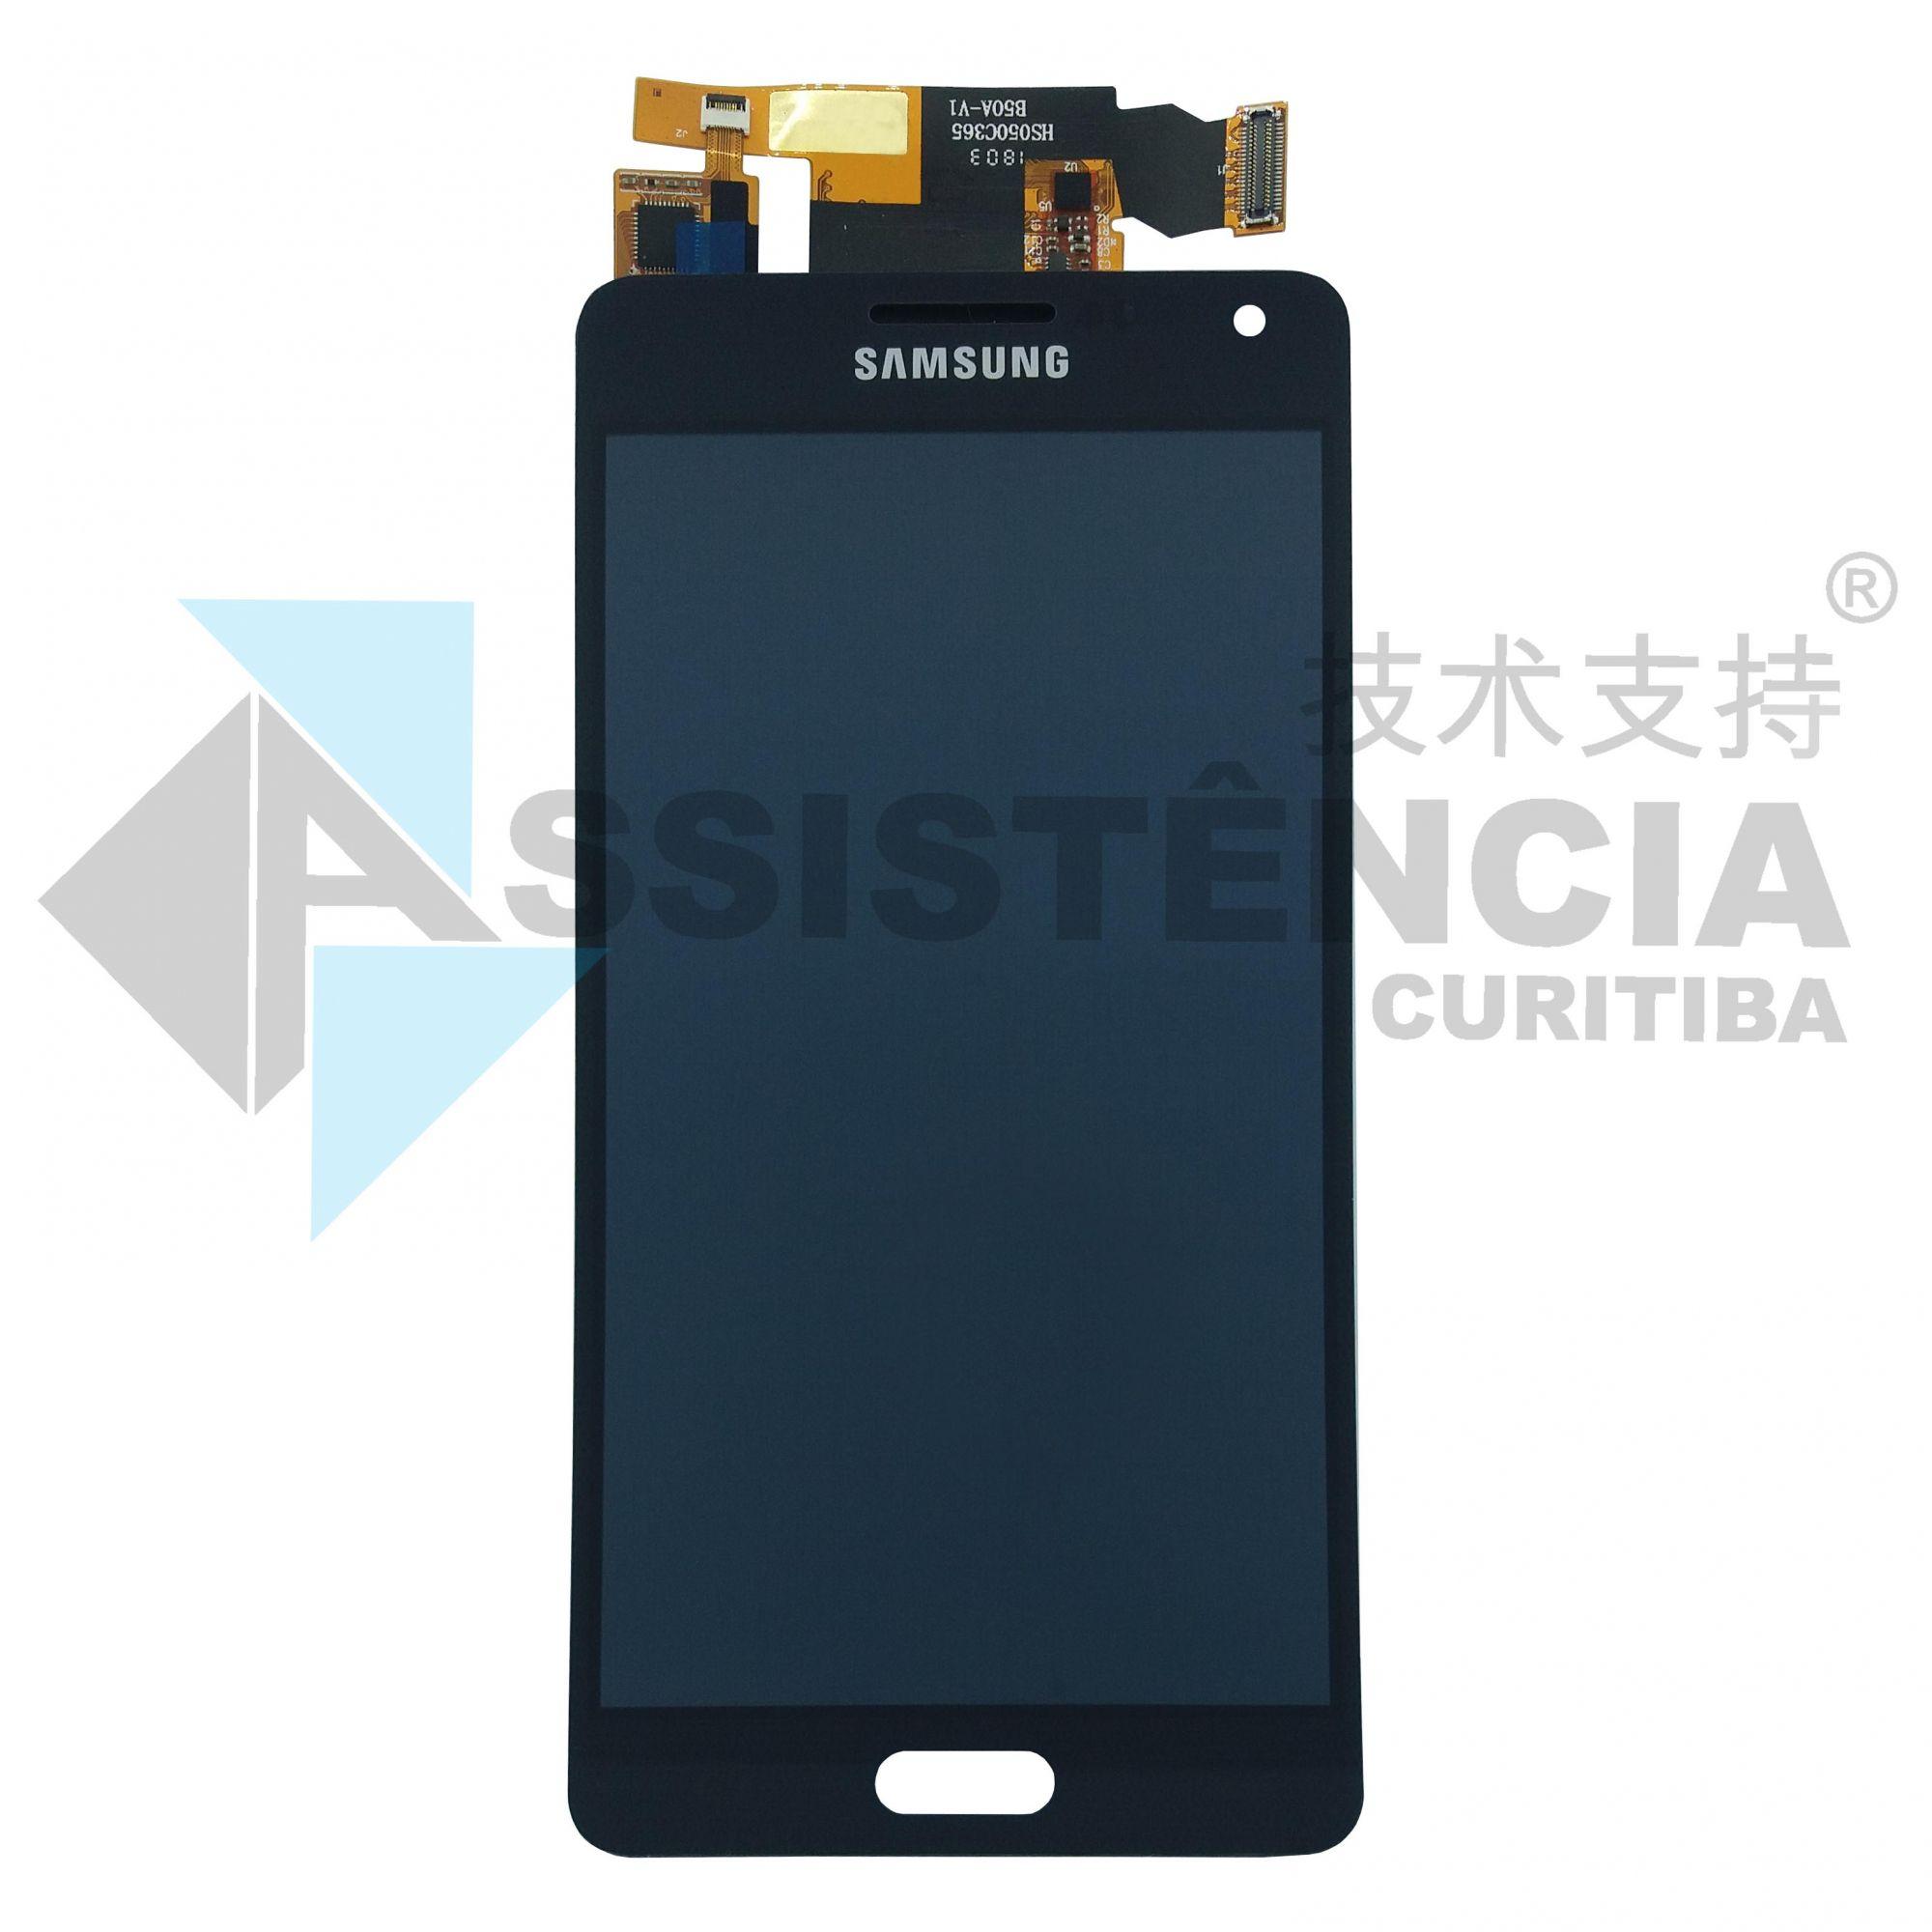 Tela Display Samsung Galaxy A5 A500 Com Brilho Preto